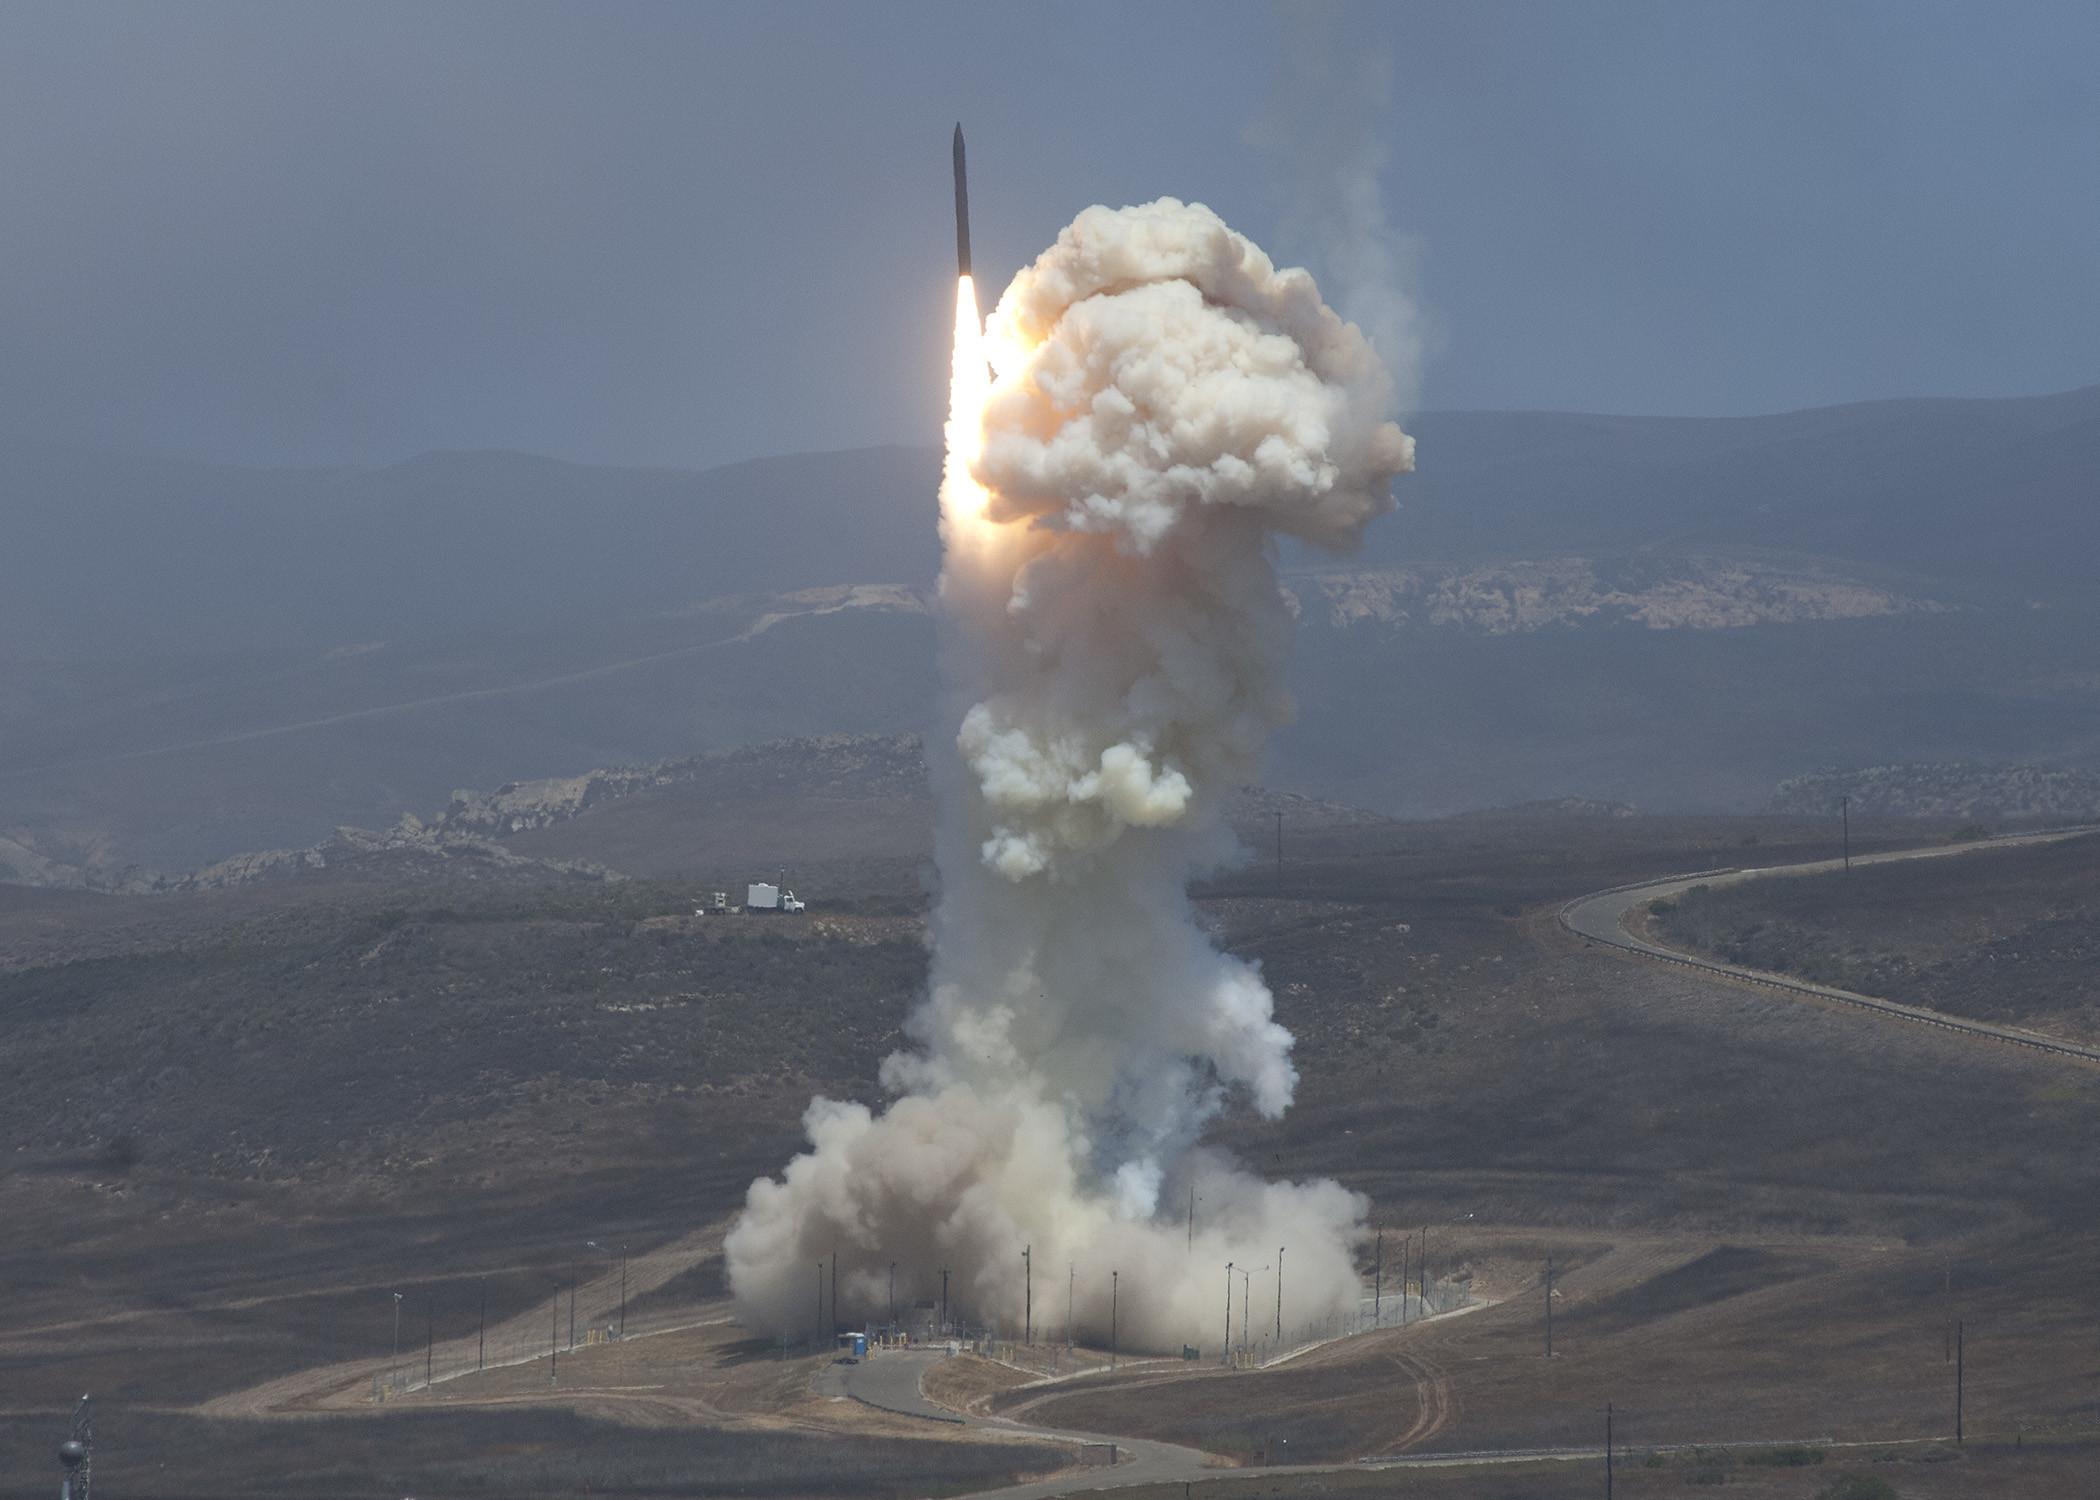 "<p>Фото: © Flickr/<a href=""https://www.flickr.com/photos/mdabmds/"" target=""_self"">U.S. Missile Defense Agency</a></p>"